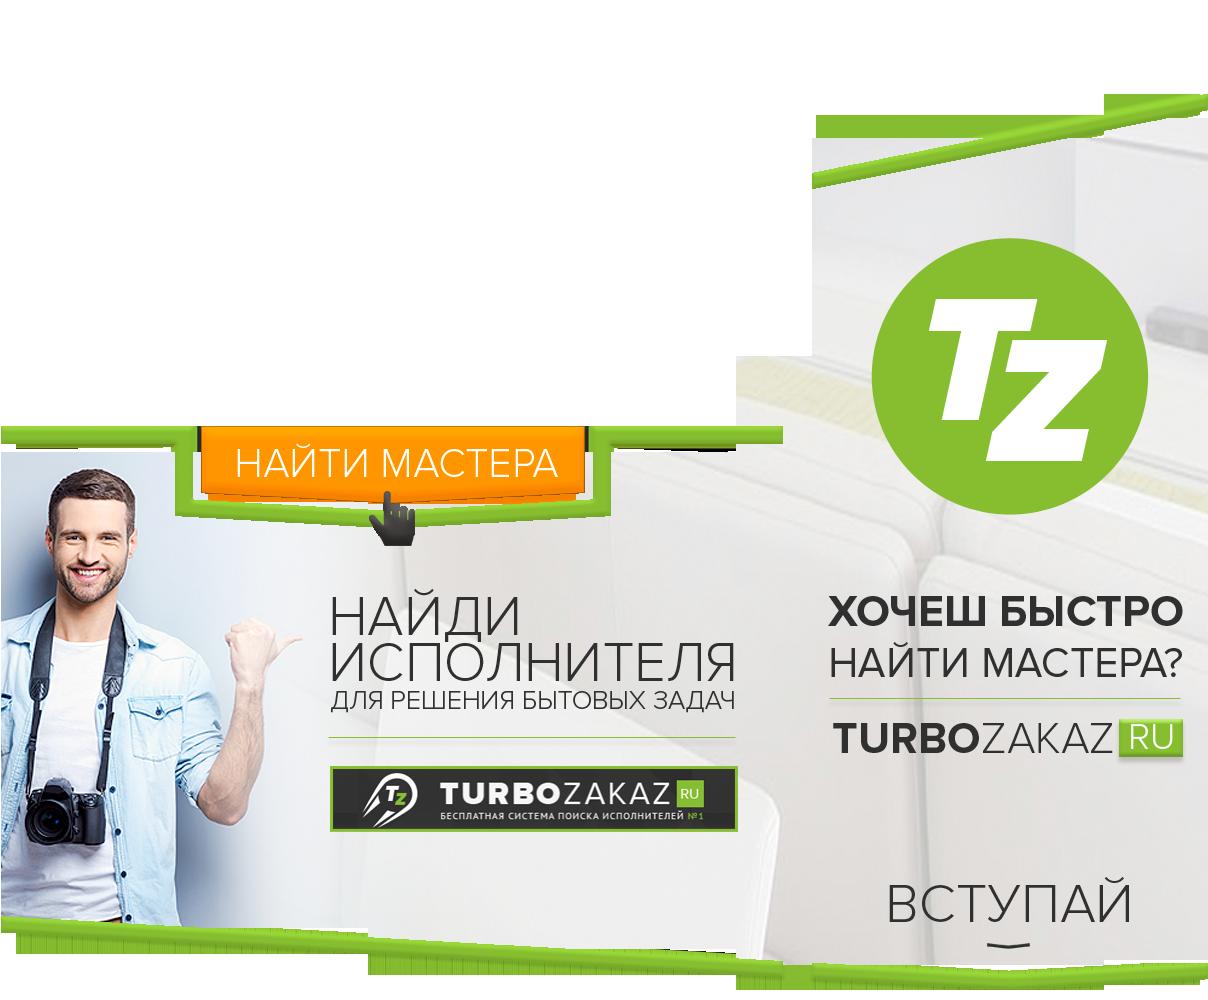 Турбозаказ